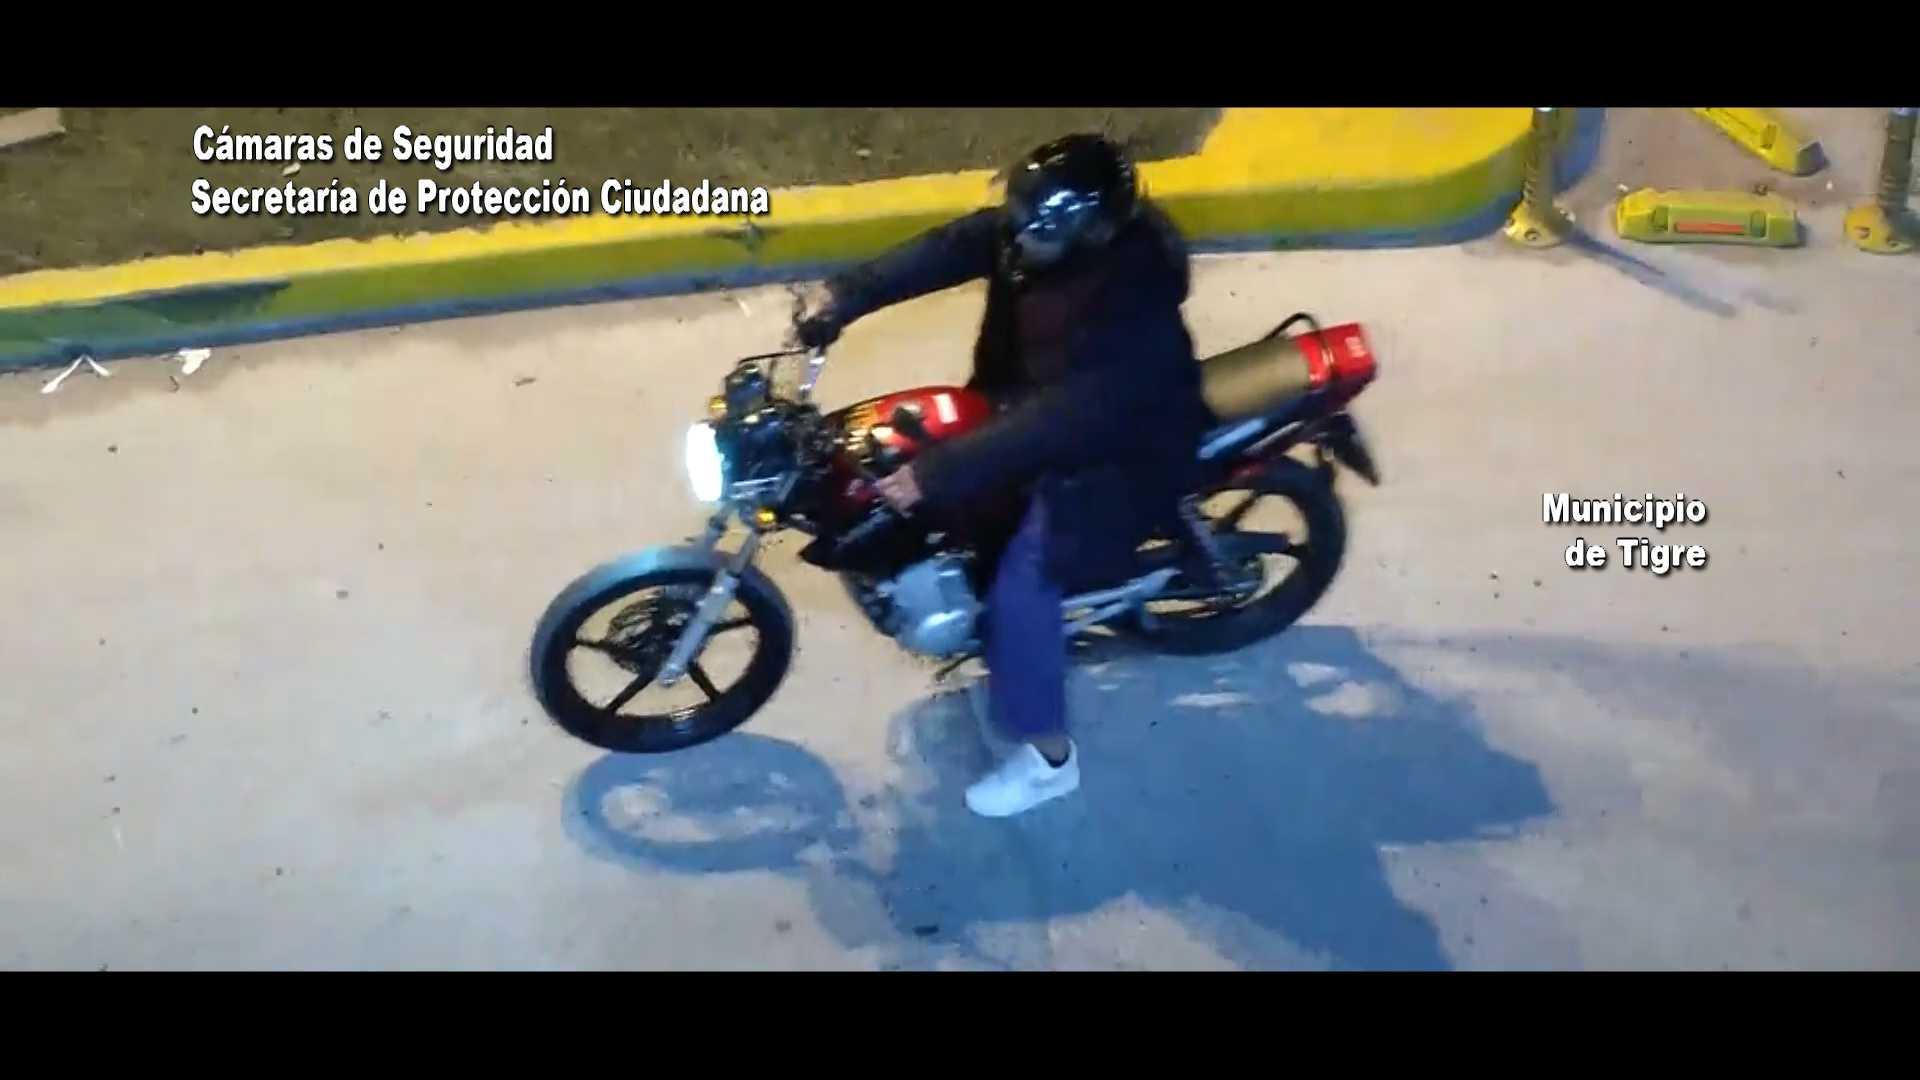 En Benavídez detienen a motociclista que circulaba con 1,52 g/l de alcohol en sangre